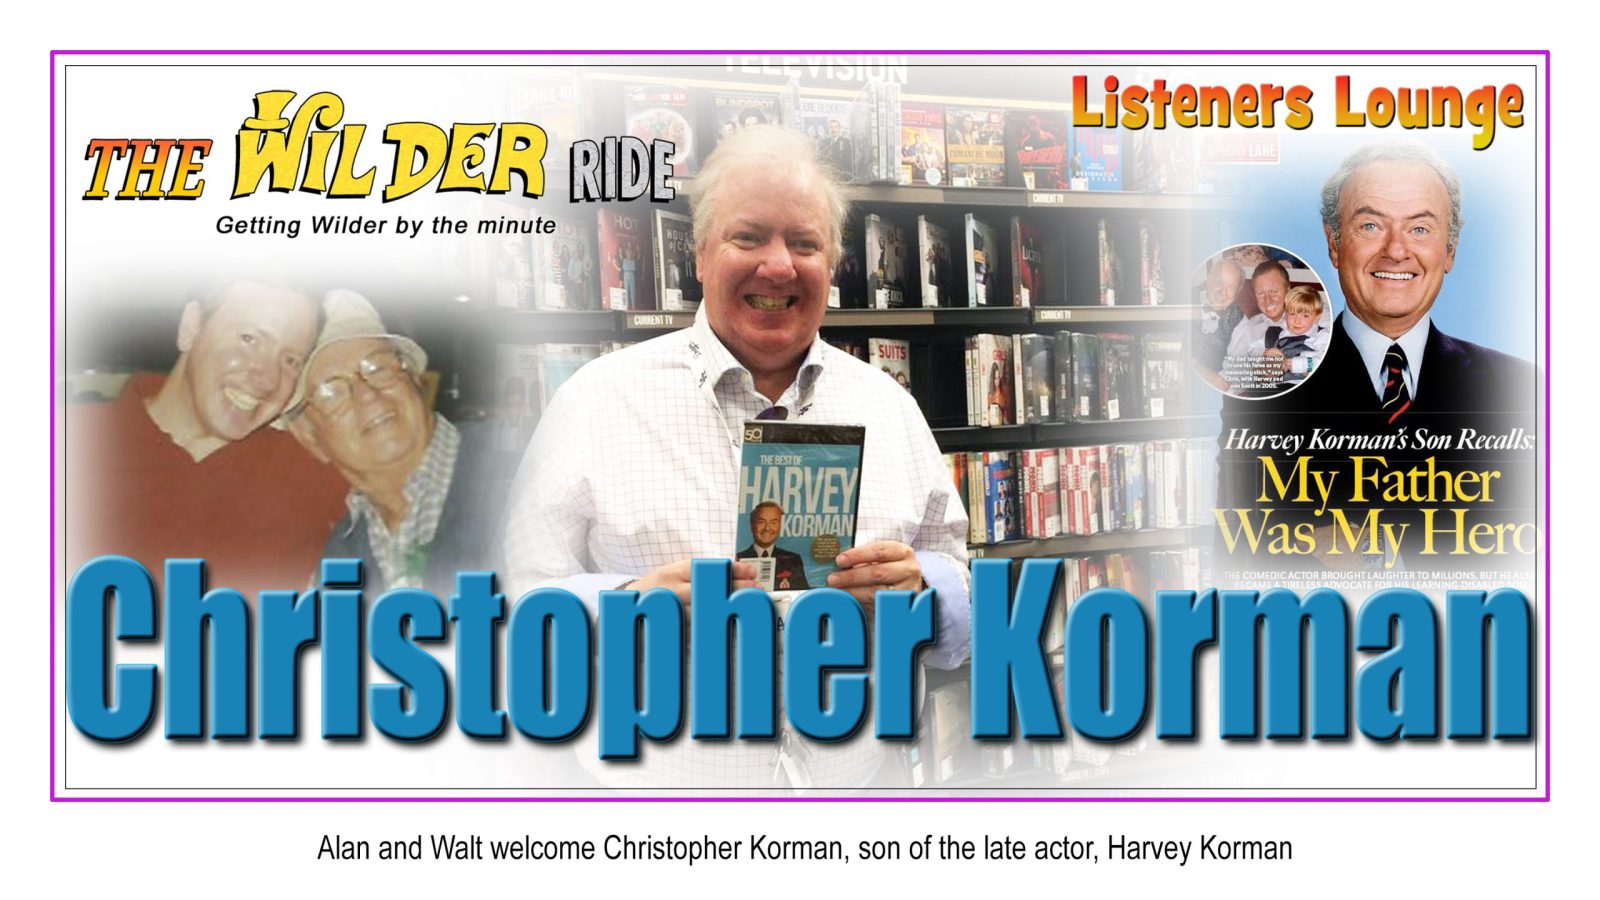 Christopher Korman